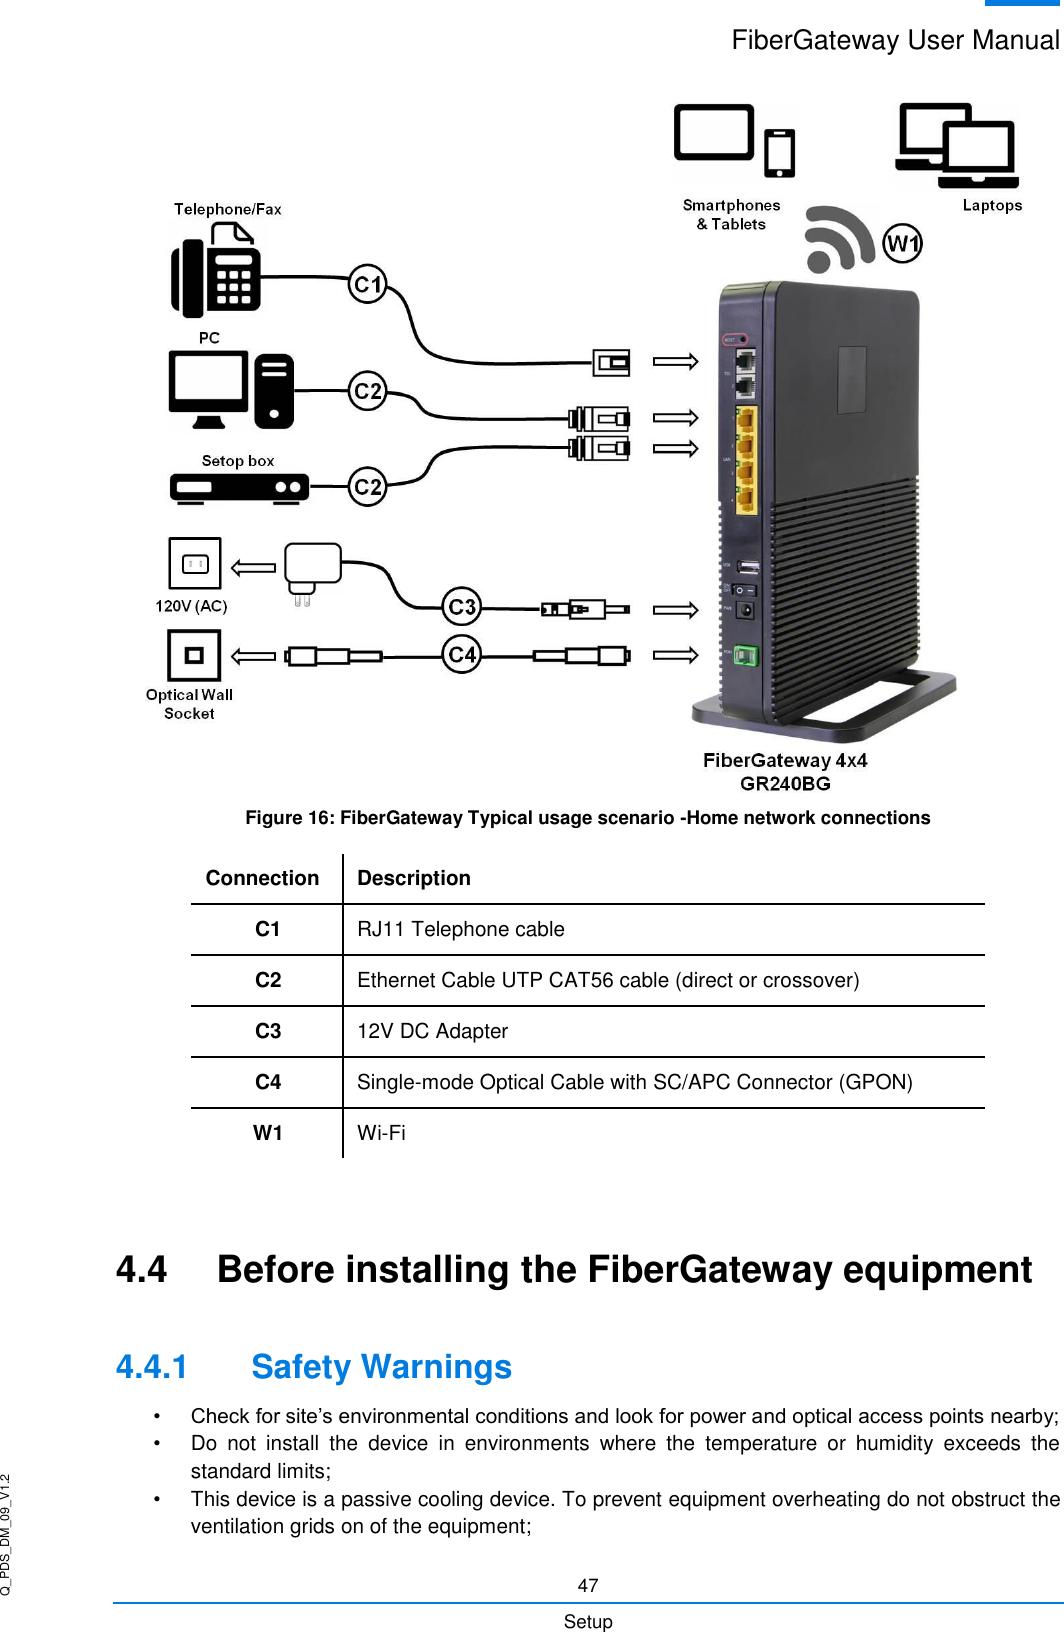 Altice Labs FGW-GR240BG Fiber Gateway 4x4 User Manual Users manual